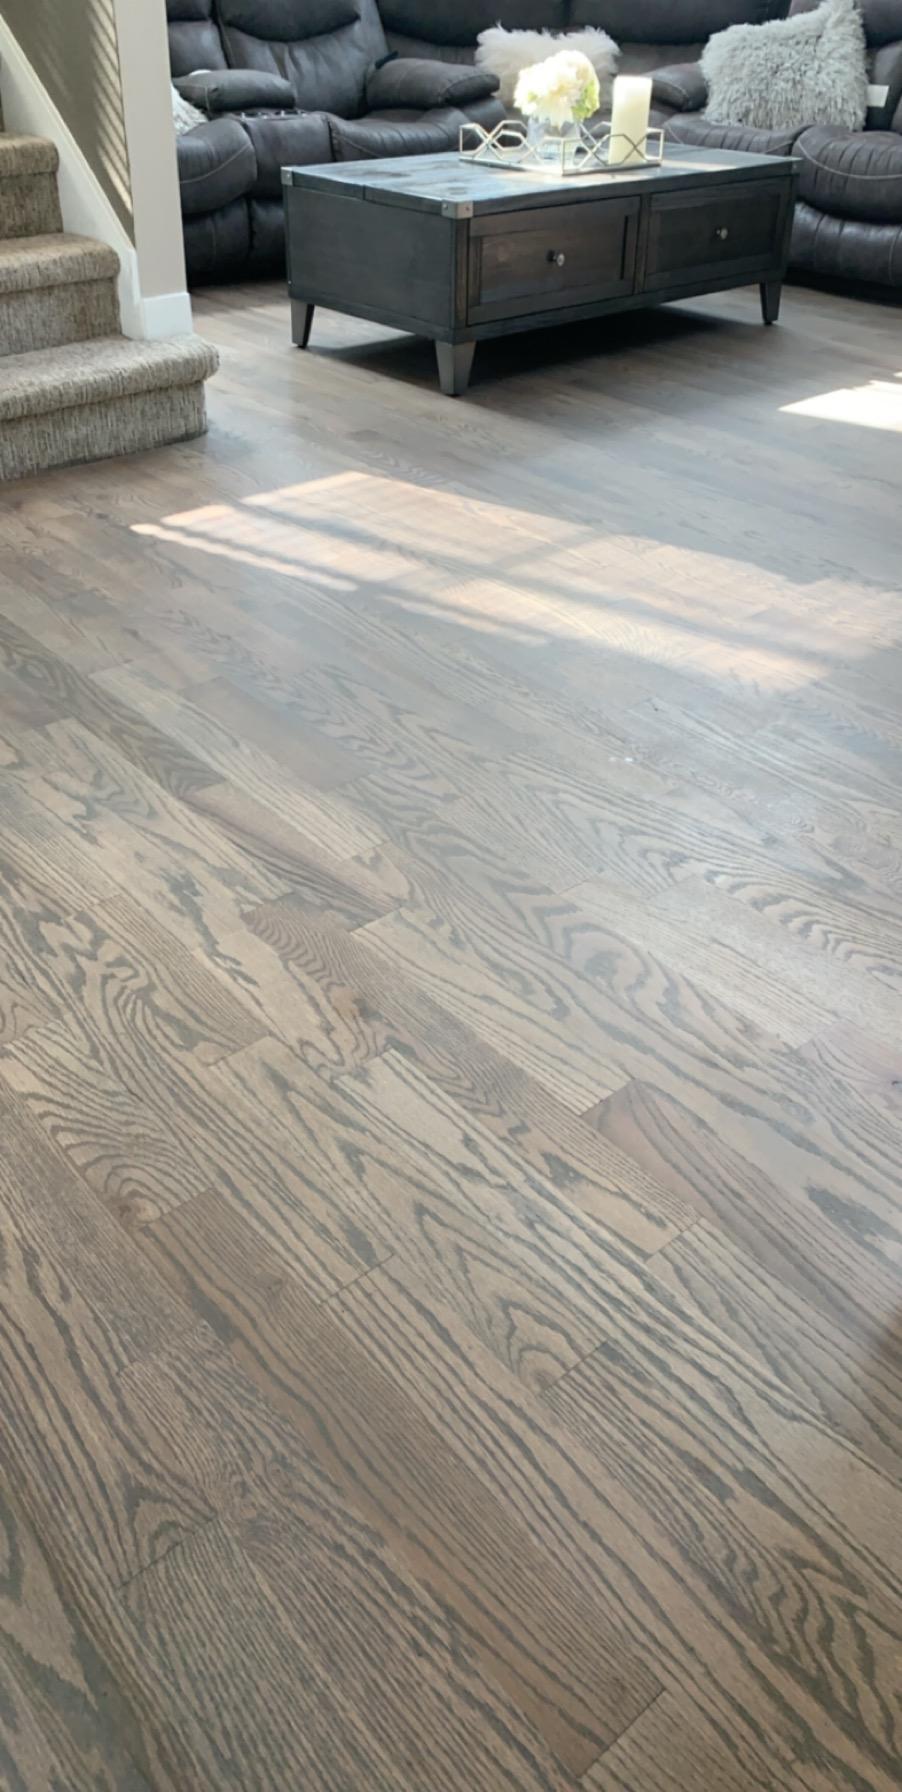 fc flooring llc dba figueroa carpet